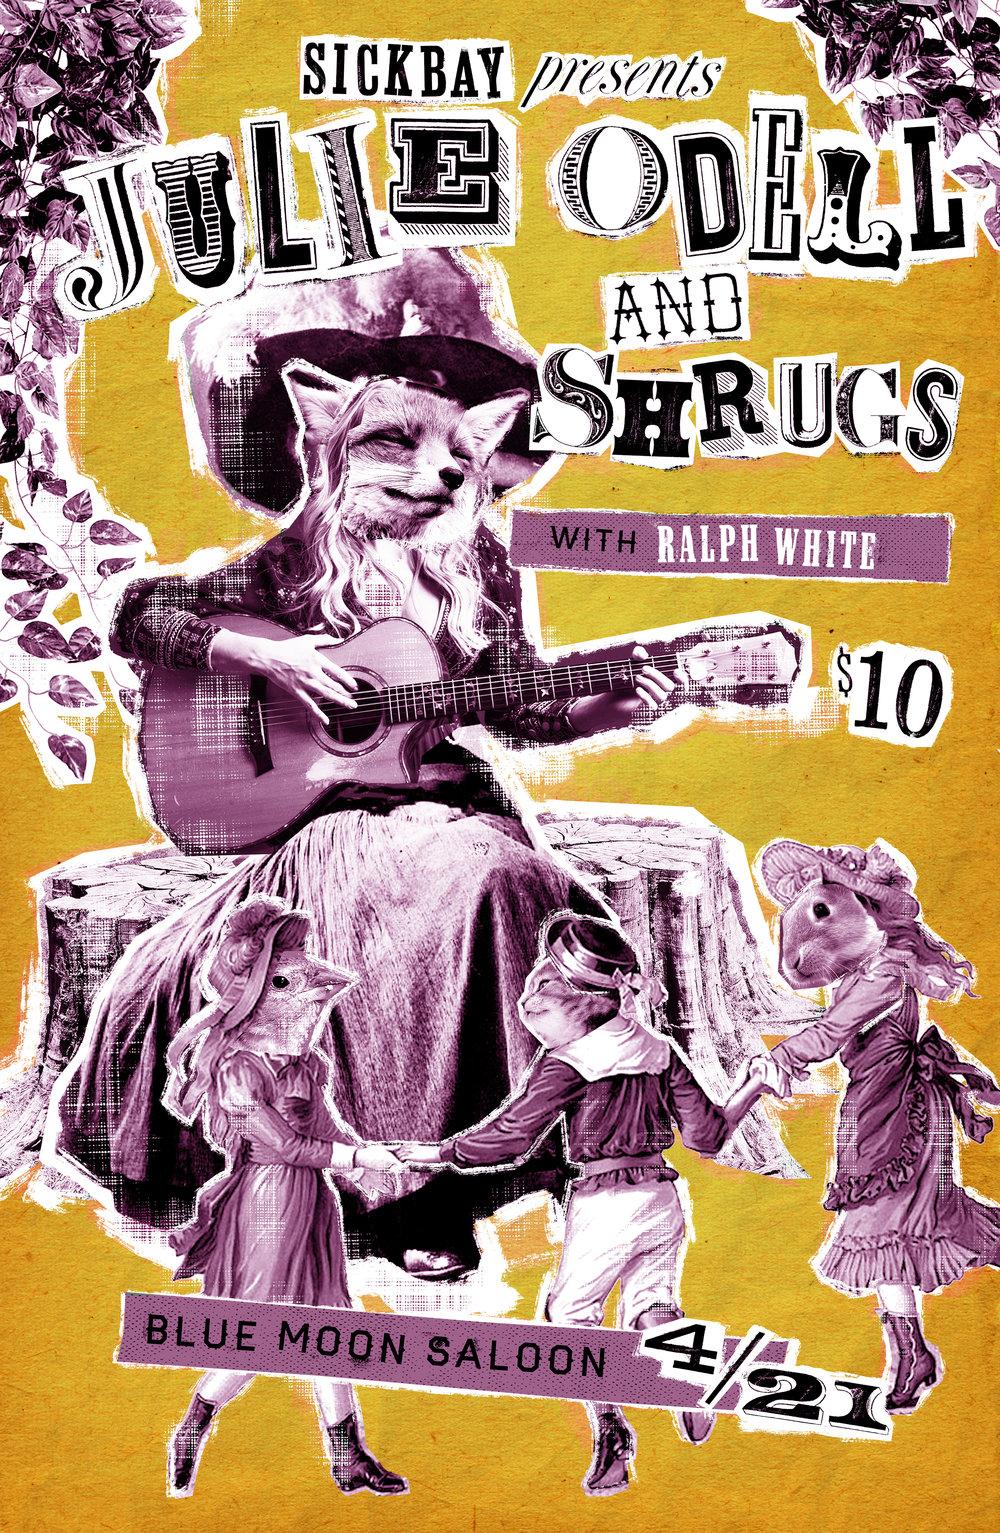 Julie Odell / Shrugs Gig Poster